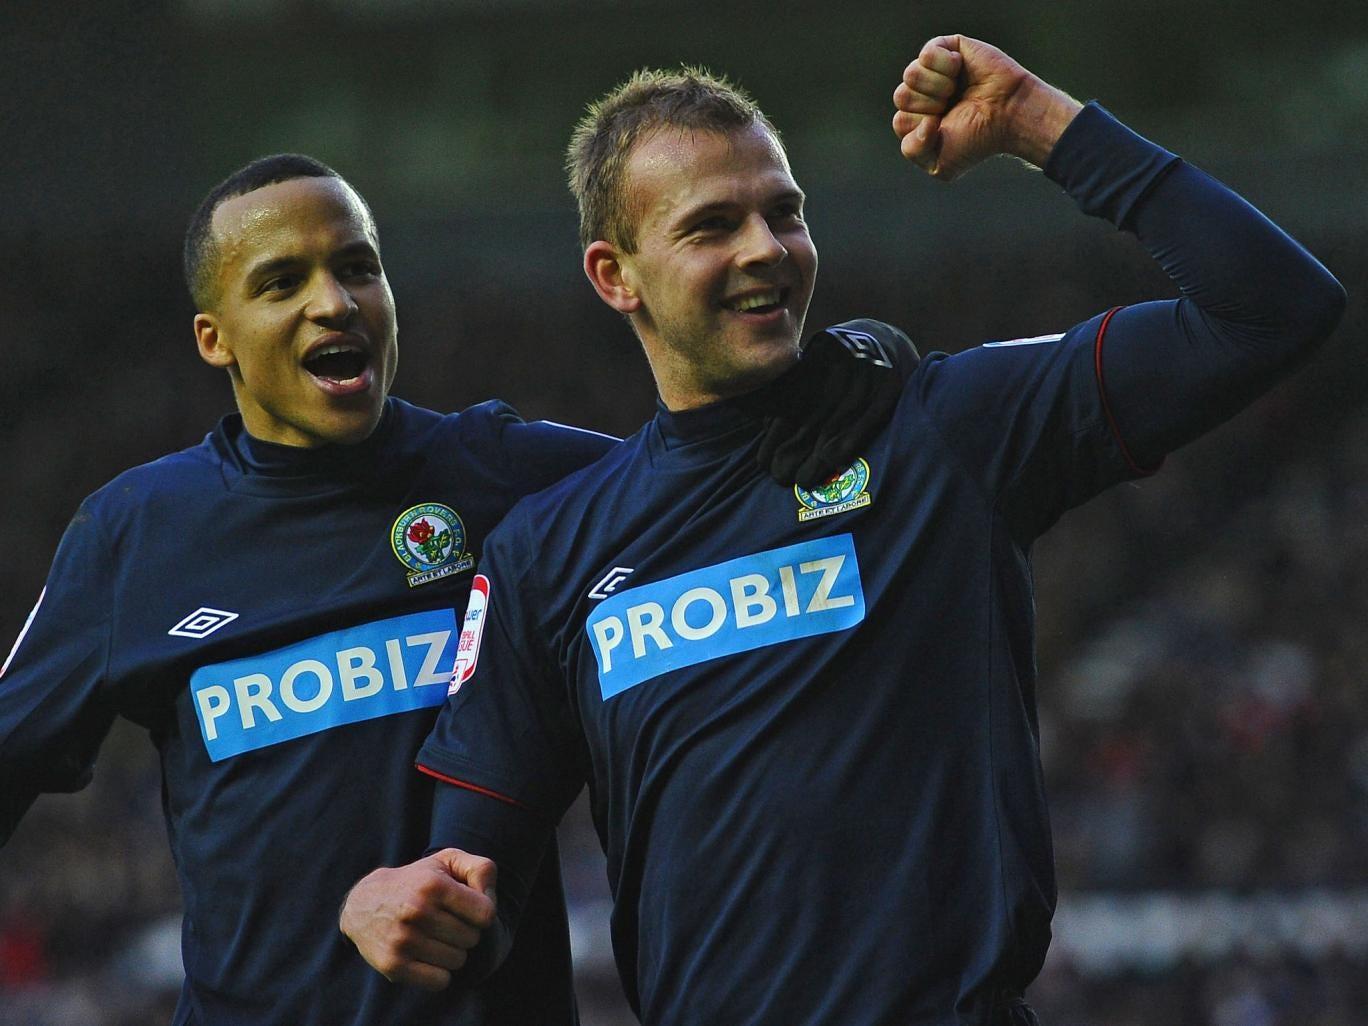 Roy Keane let Jordan Rhodes (right) slip through his fingers in 2009